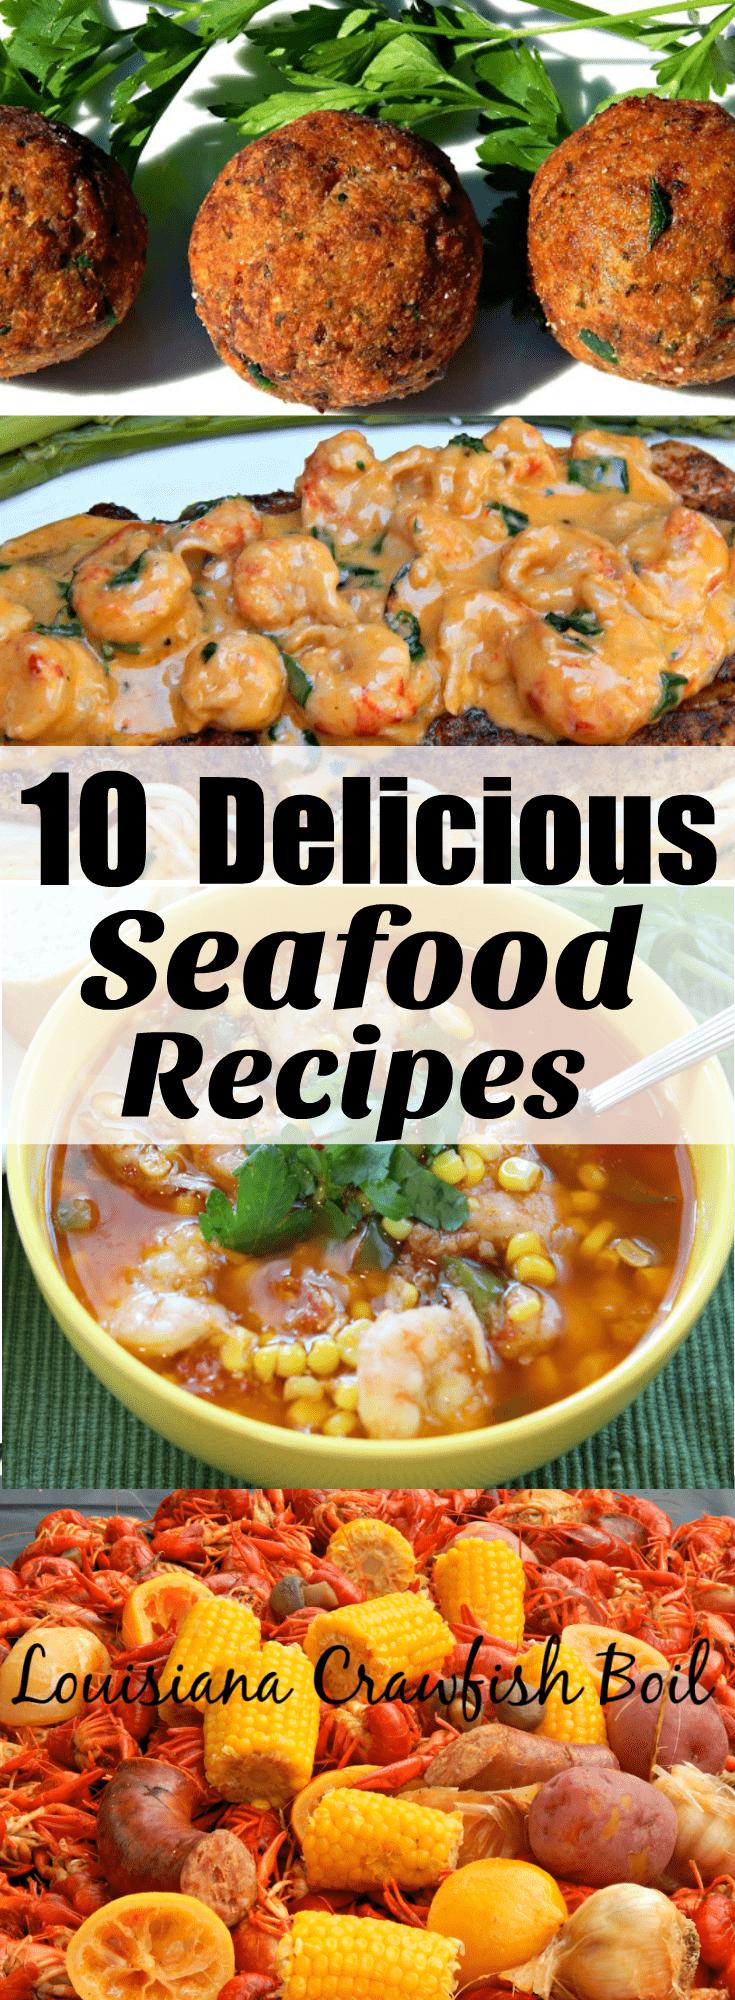 10 Delicious Seafood recipes